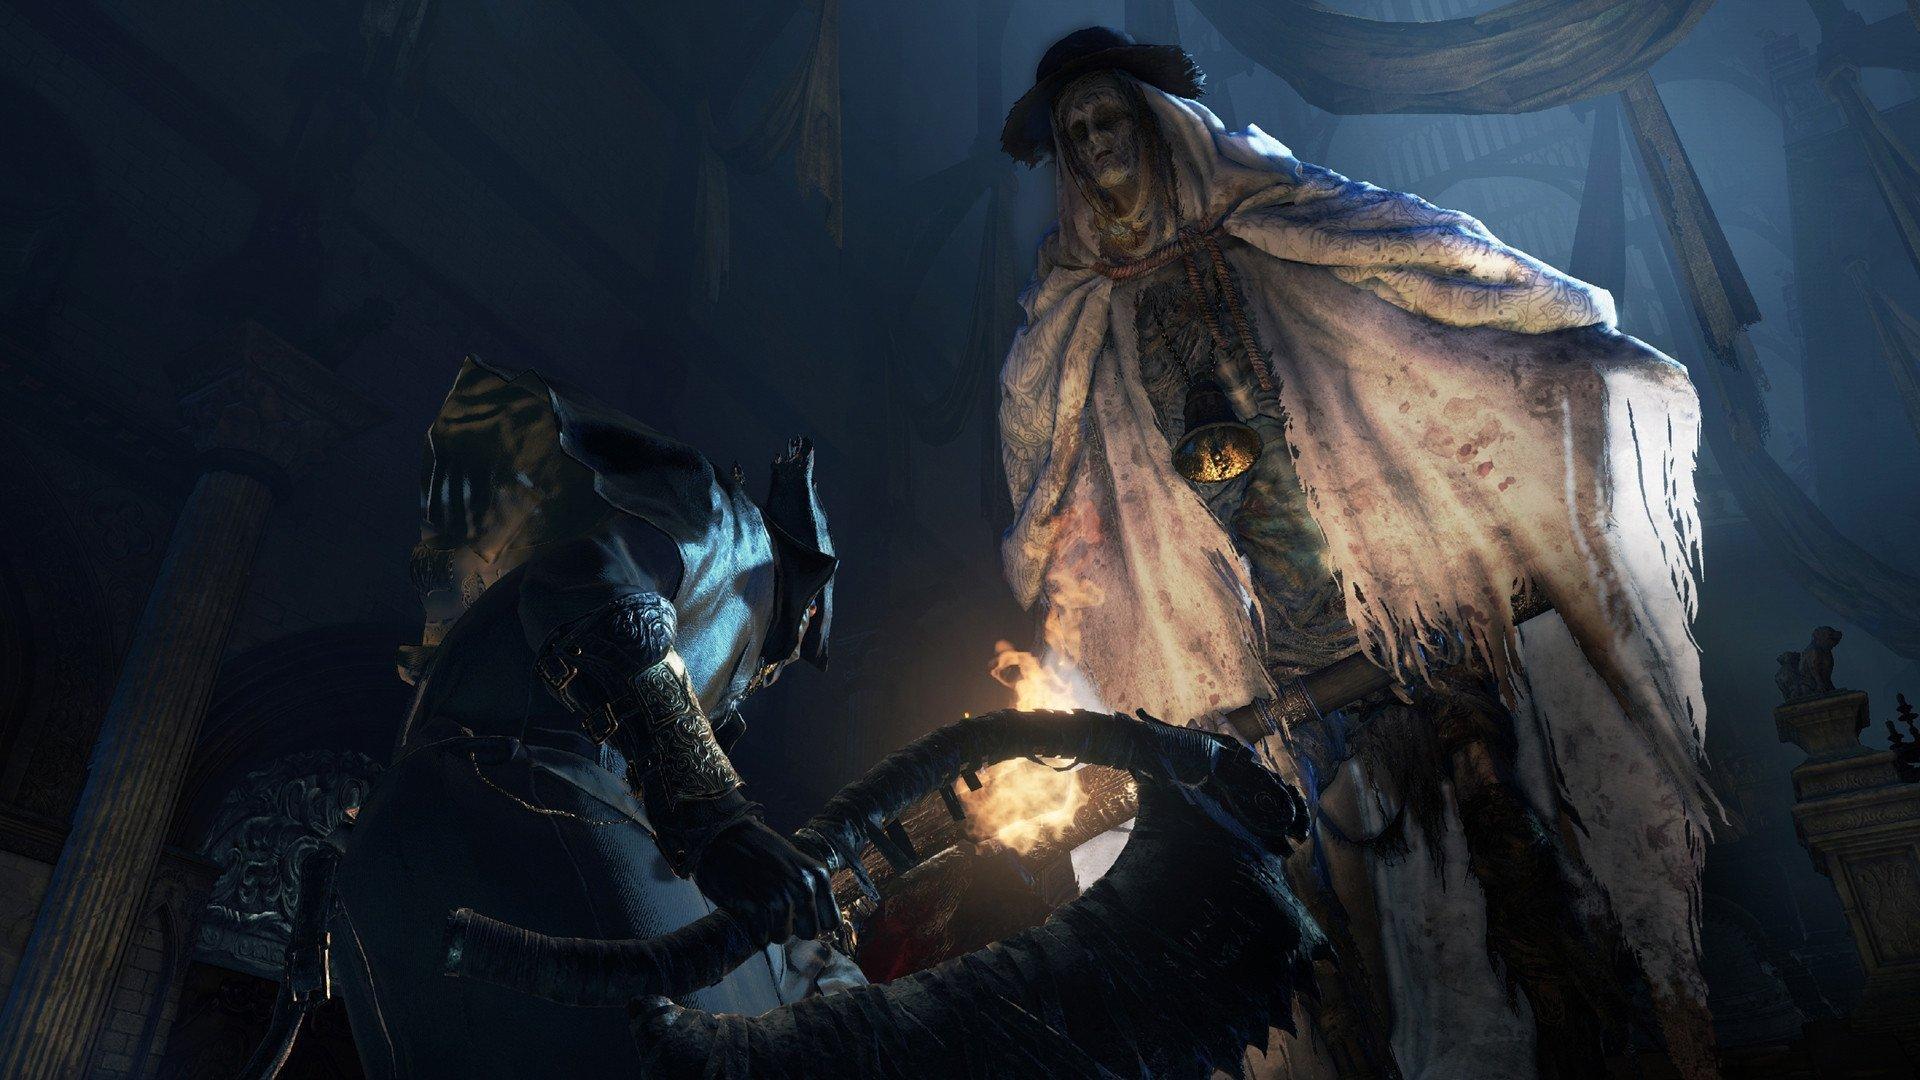 Amazon.it, piovono leak: ecco Bloodborne 2, Sunset Overdrive 2 e Splinter Cell thumbnail